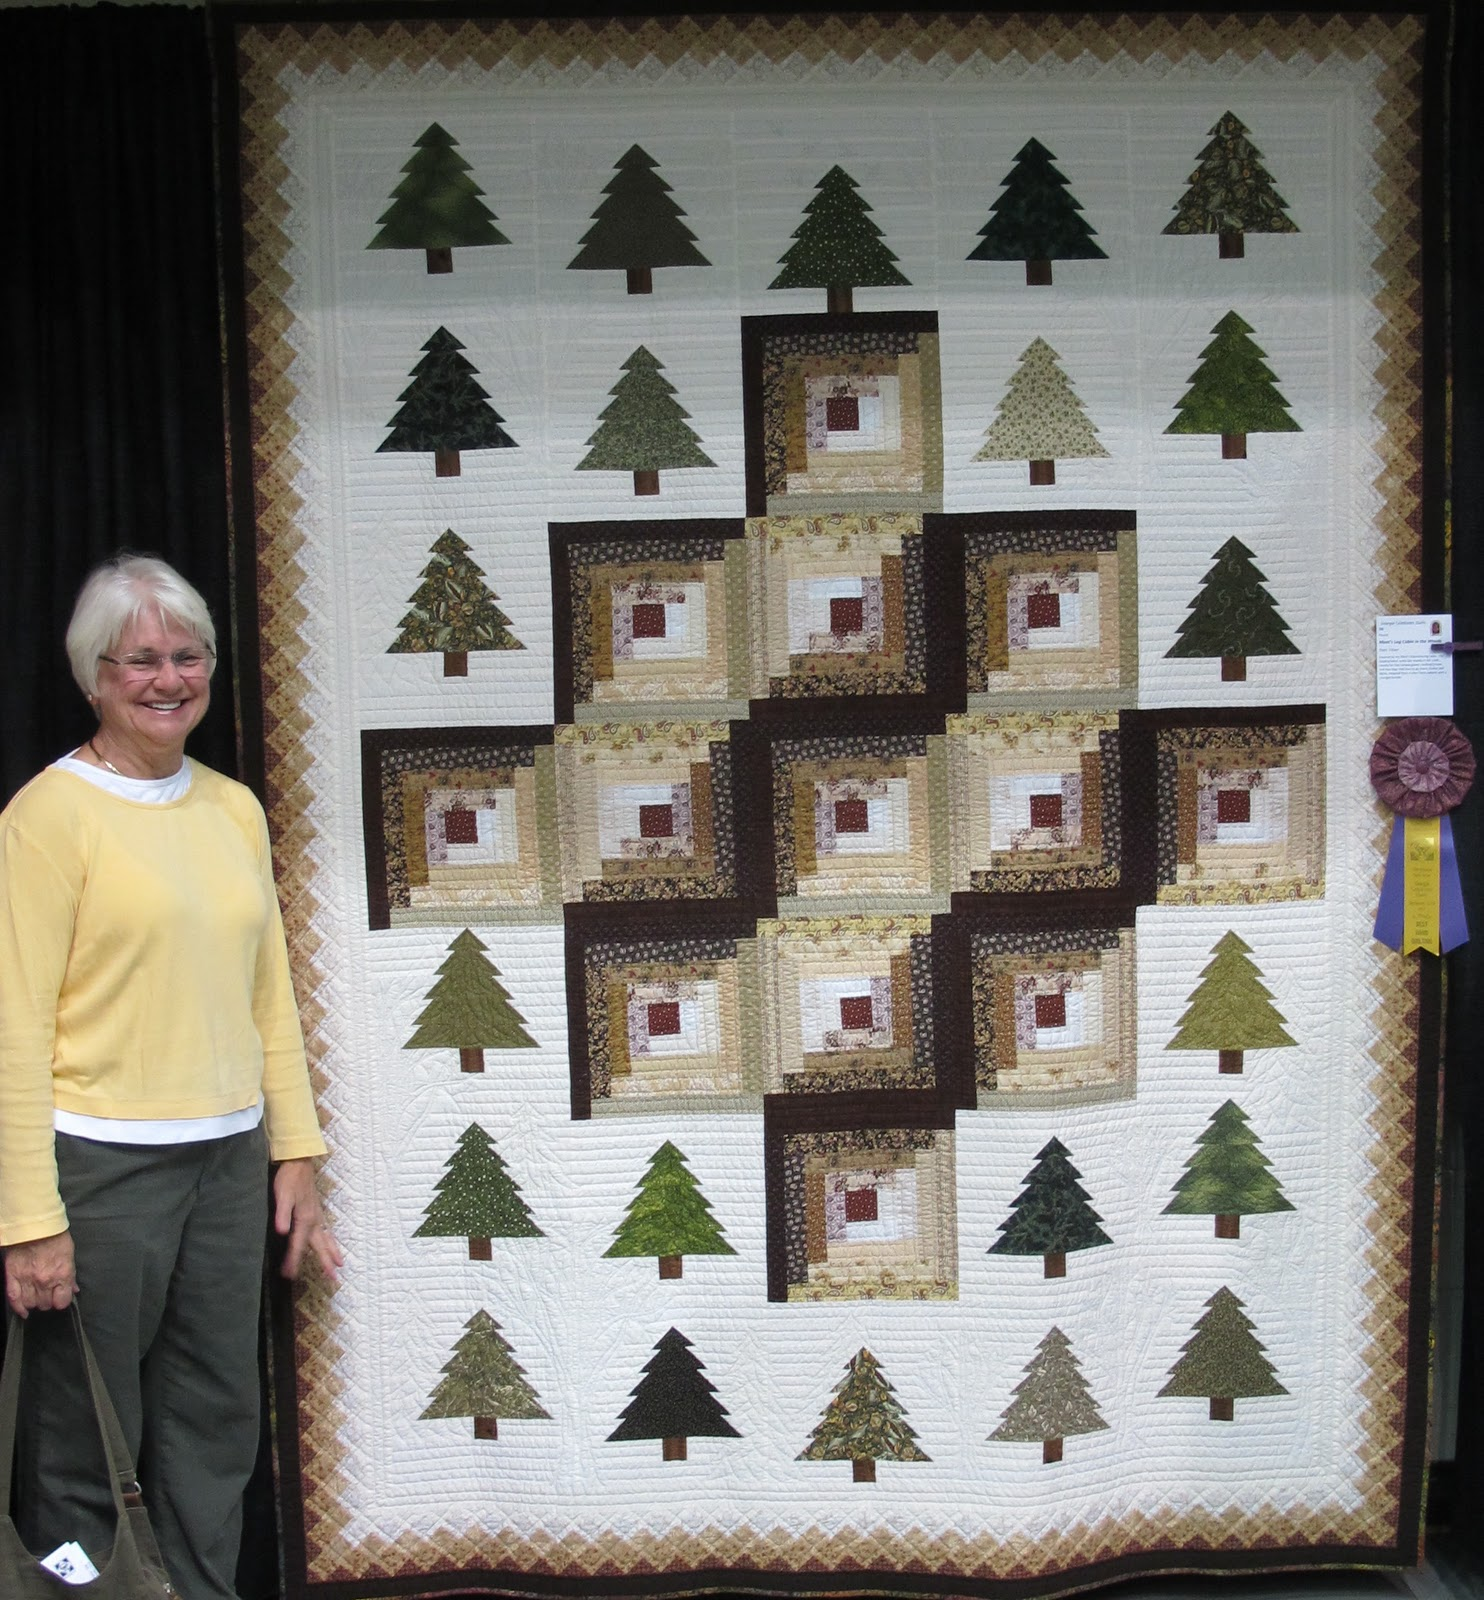 Quiltin' Jenny: East Cobb Quilt Guild Show - Georgia Celebrates Quilts : east cobb quilt guild - Adamdwight.com